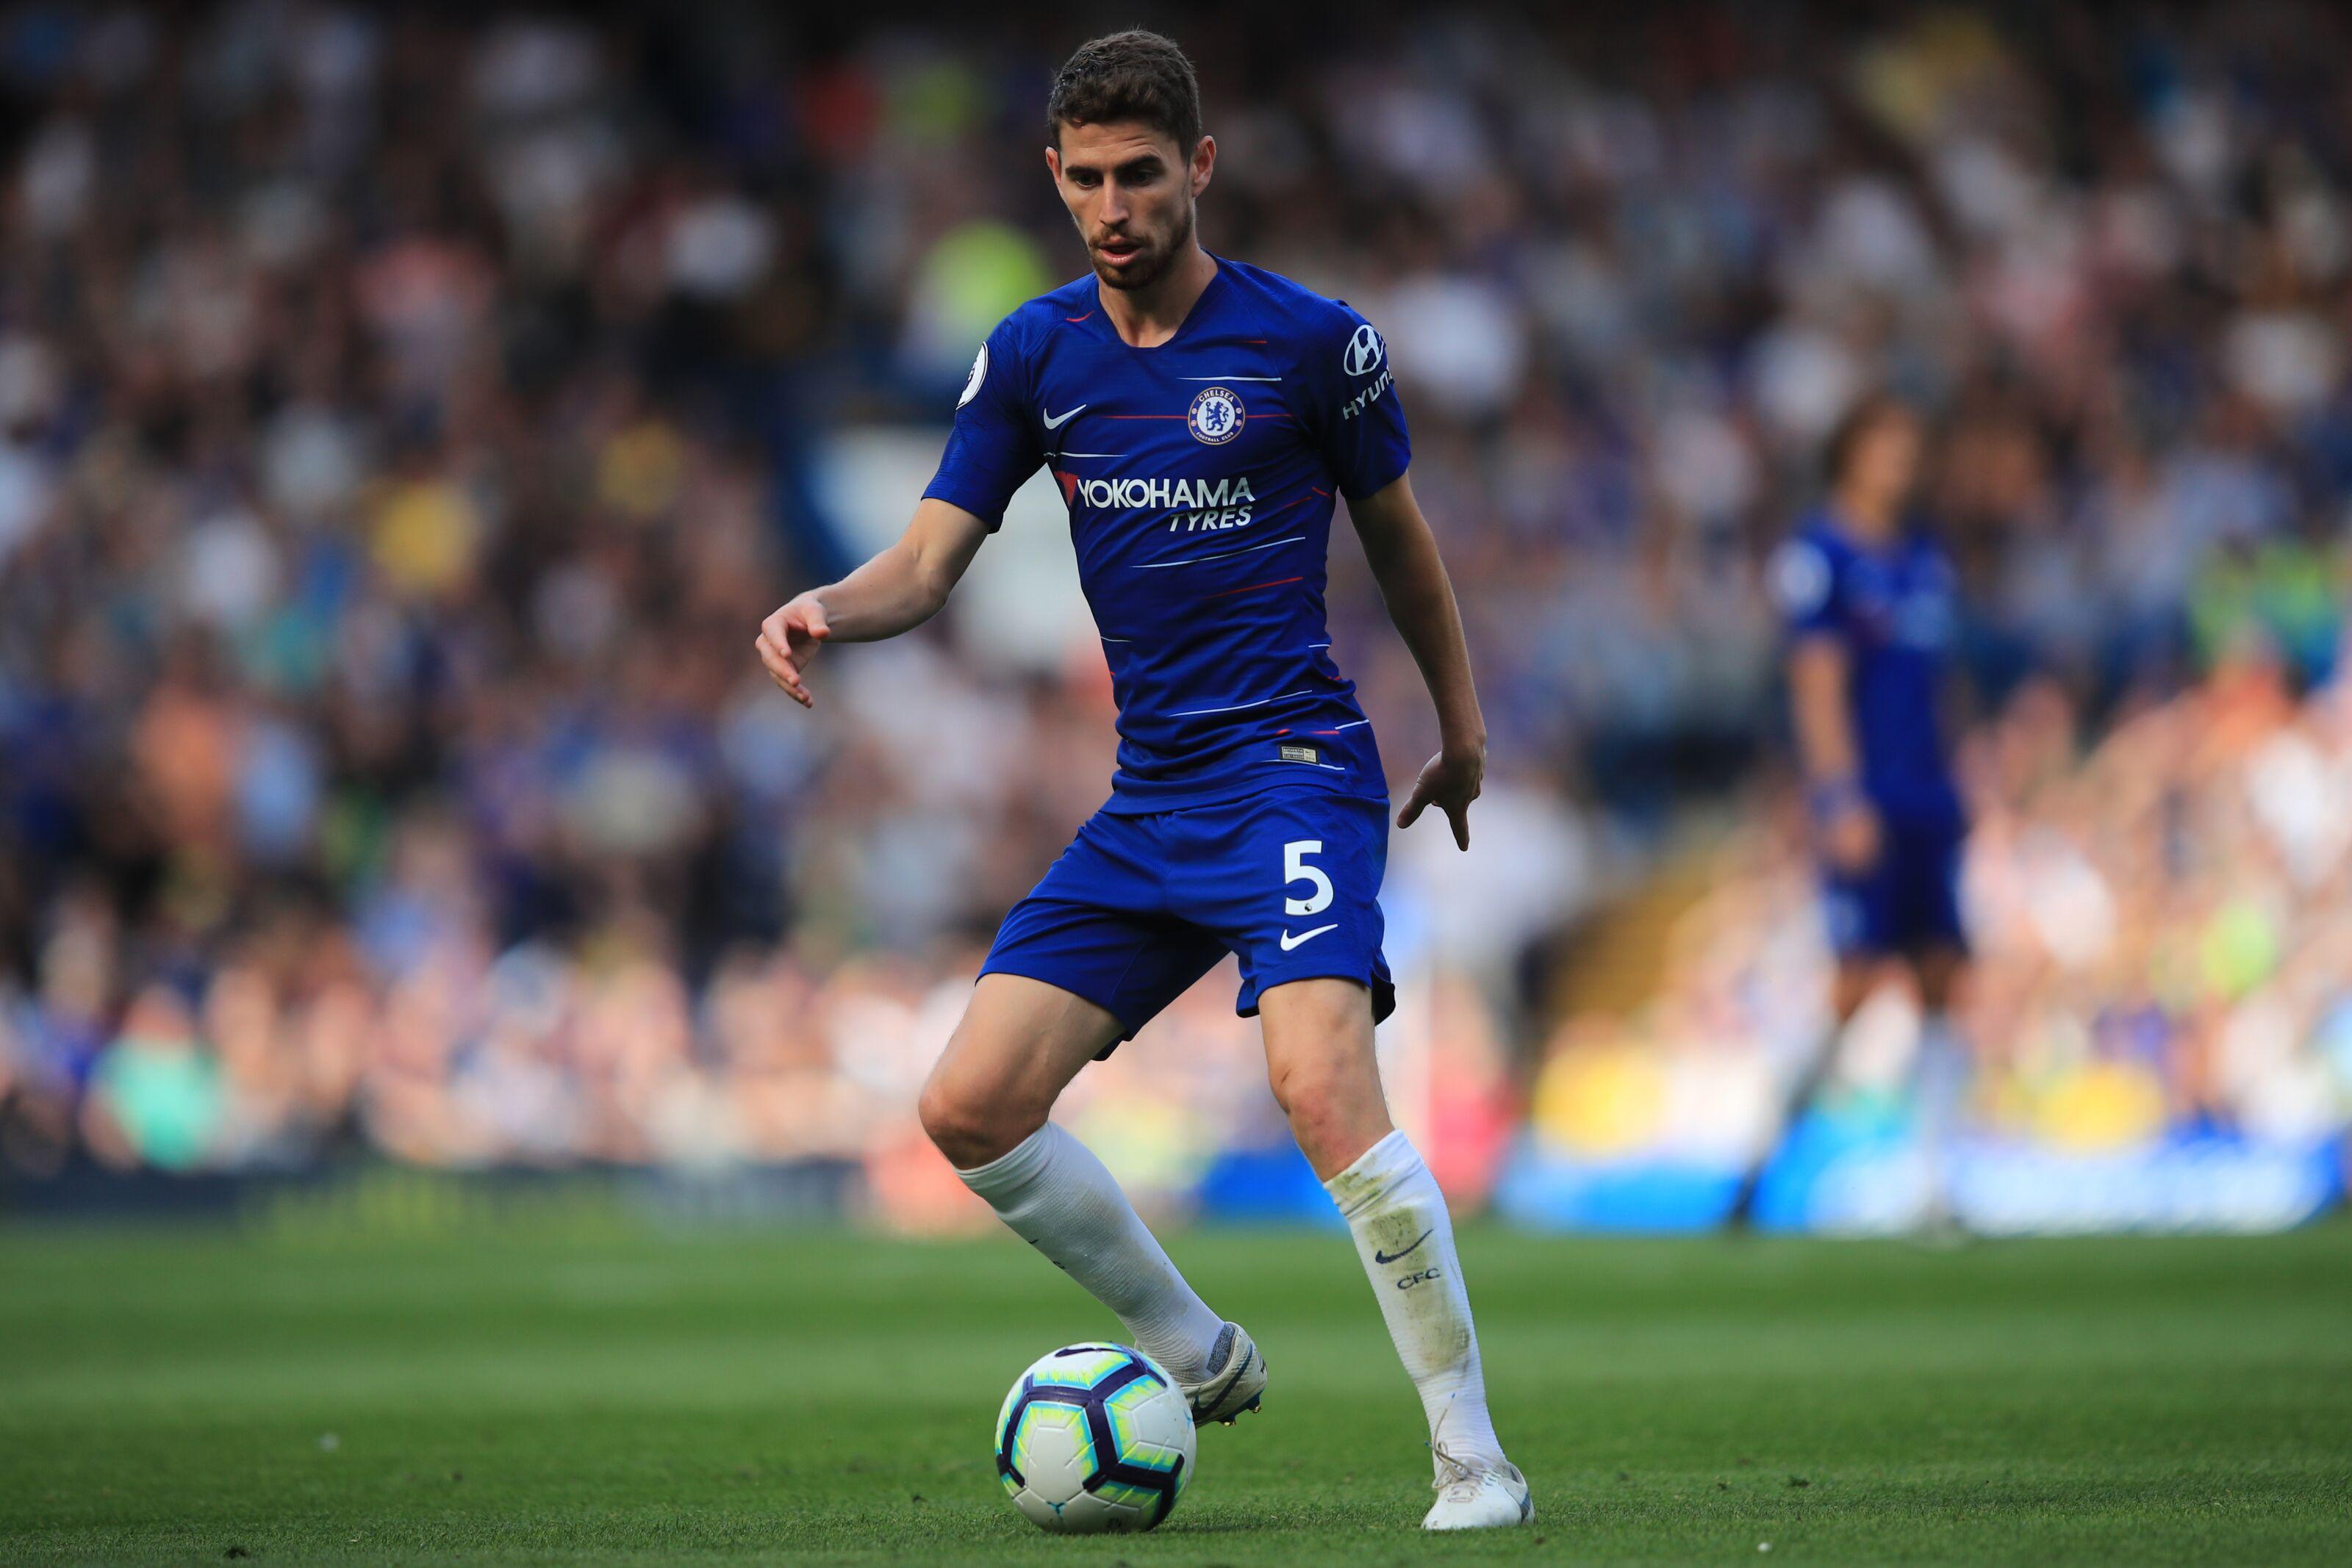 Chelsea: Jorginho, finally free to make assists, makes his first assist